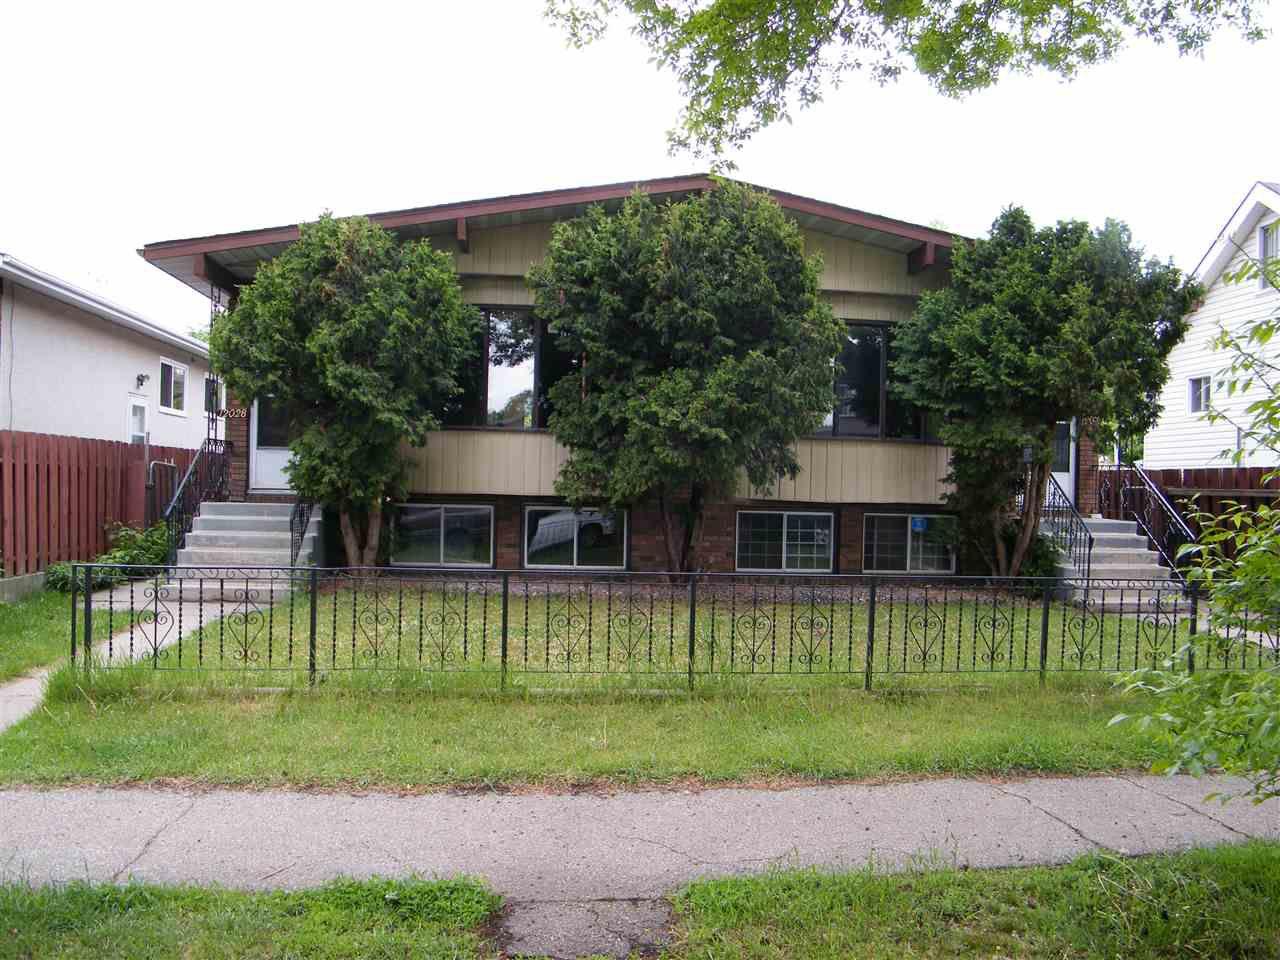 Main Photo: 12028 & 12030 88 Street in Edmonton: Zone 05 House Duplex for sale : MLS®# E4161310